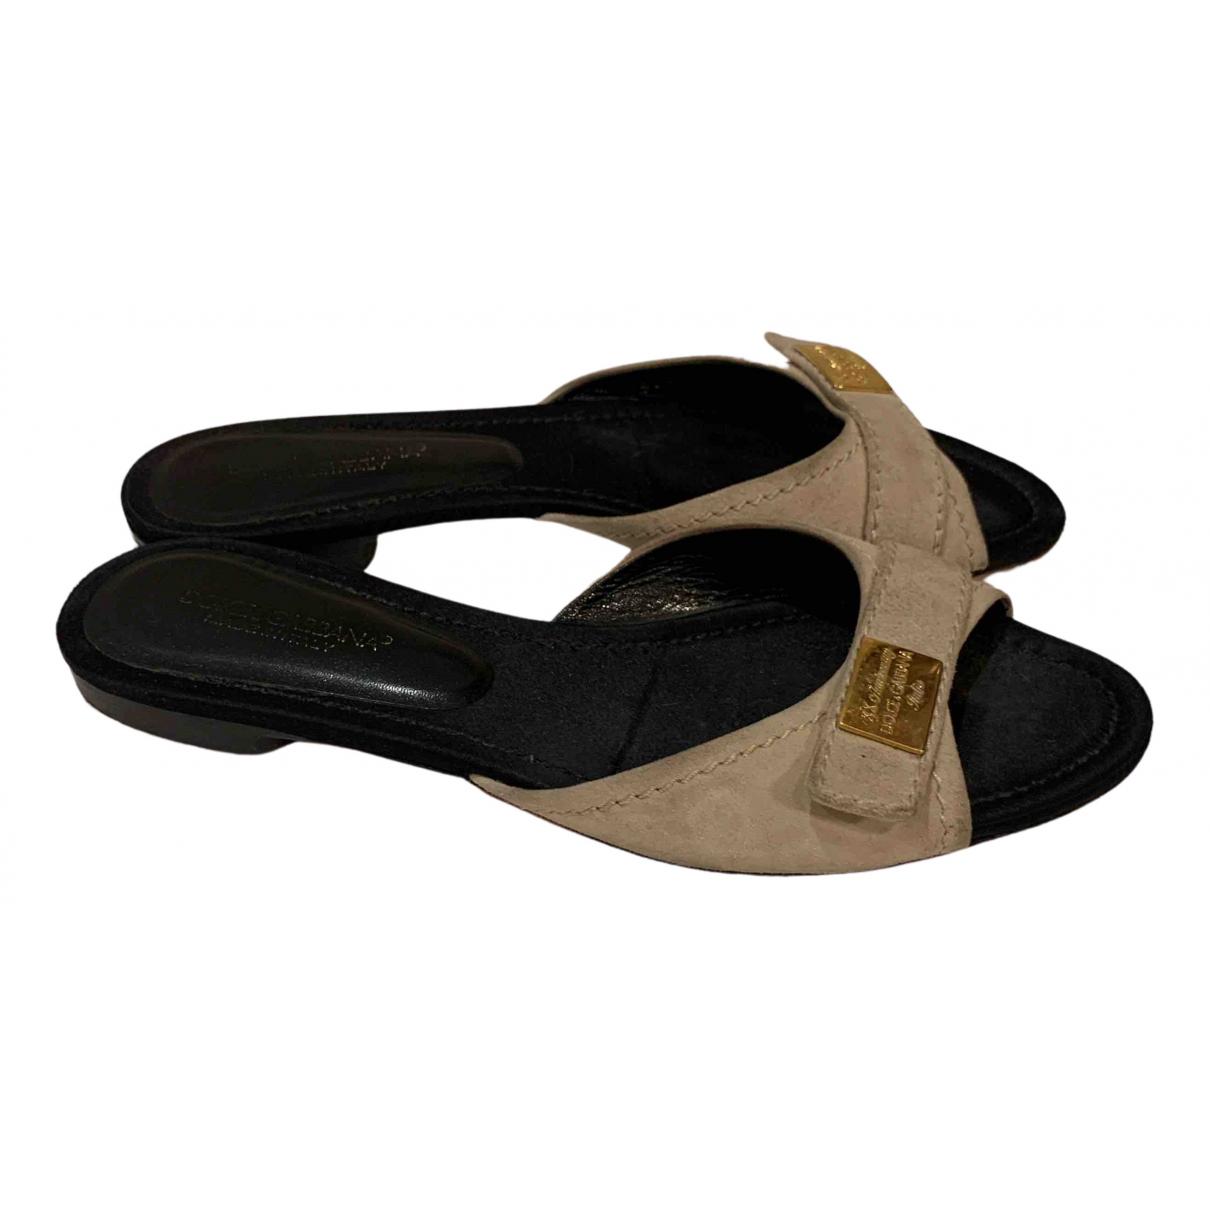 Dolce & Gabbana N Beige Suede Sandals for Women 38.5 EU